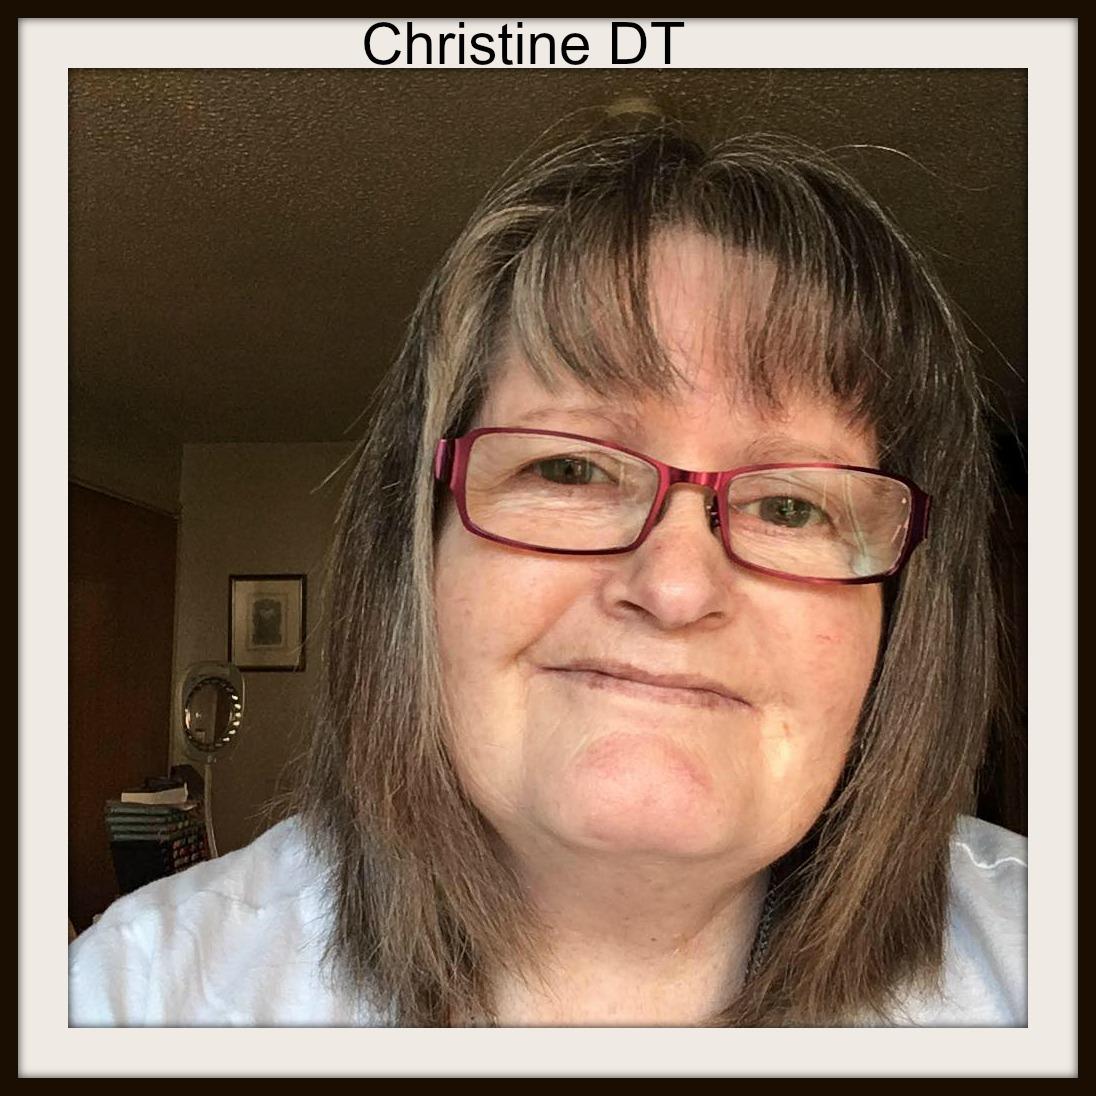 Christine DT